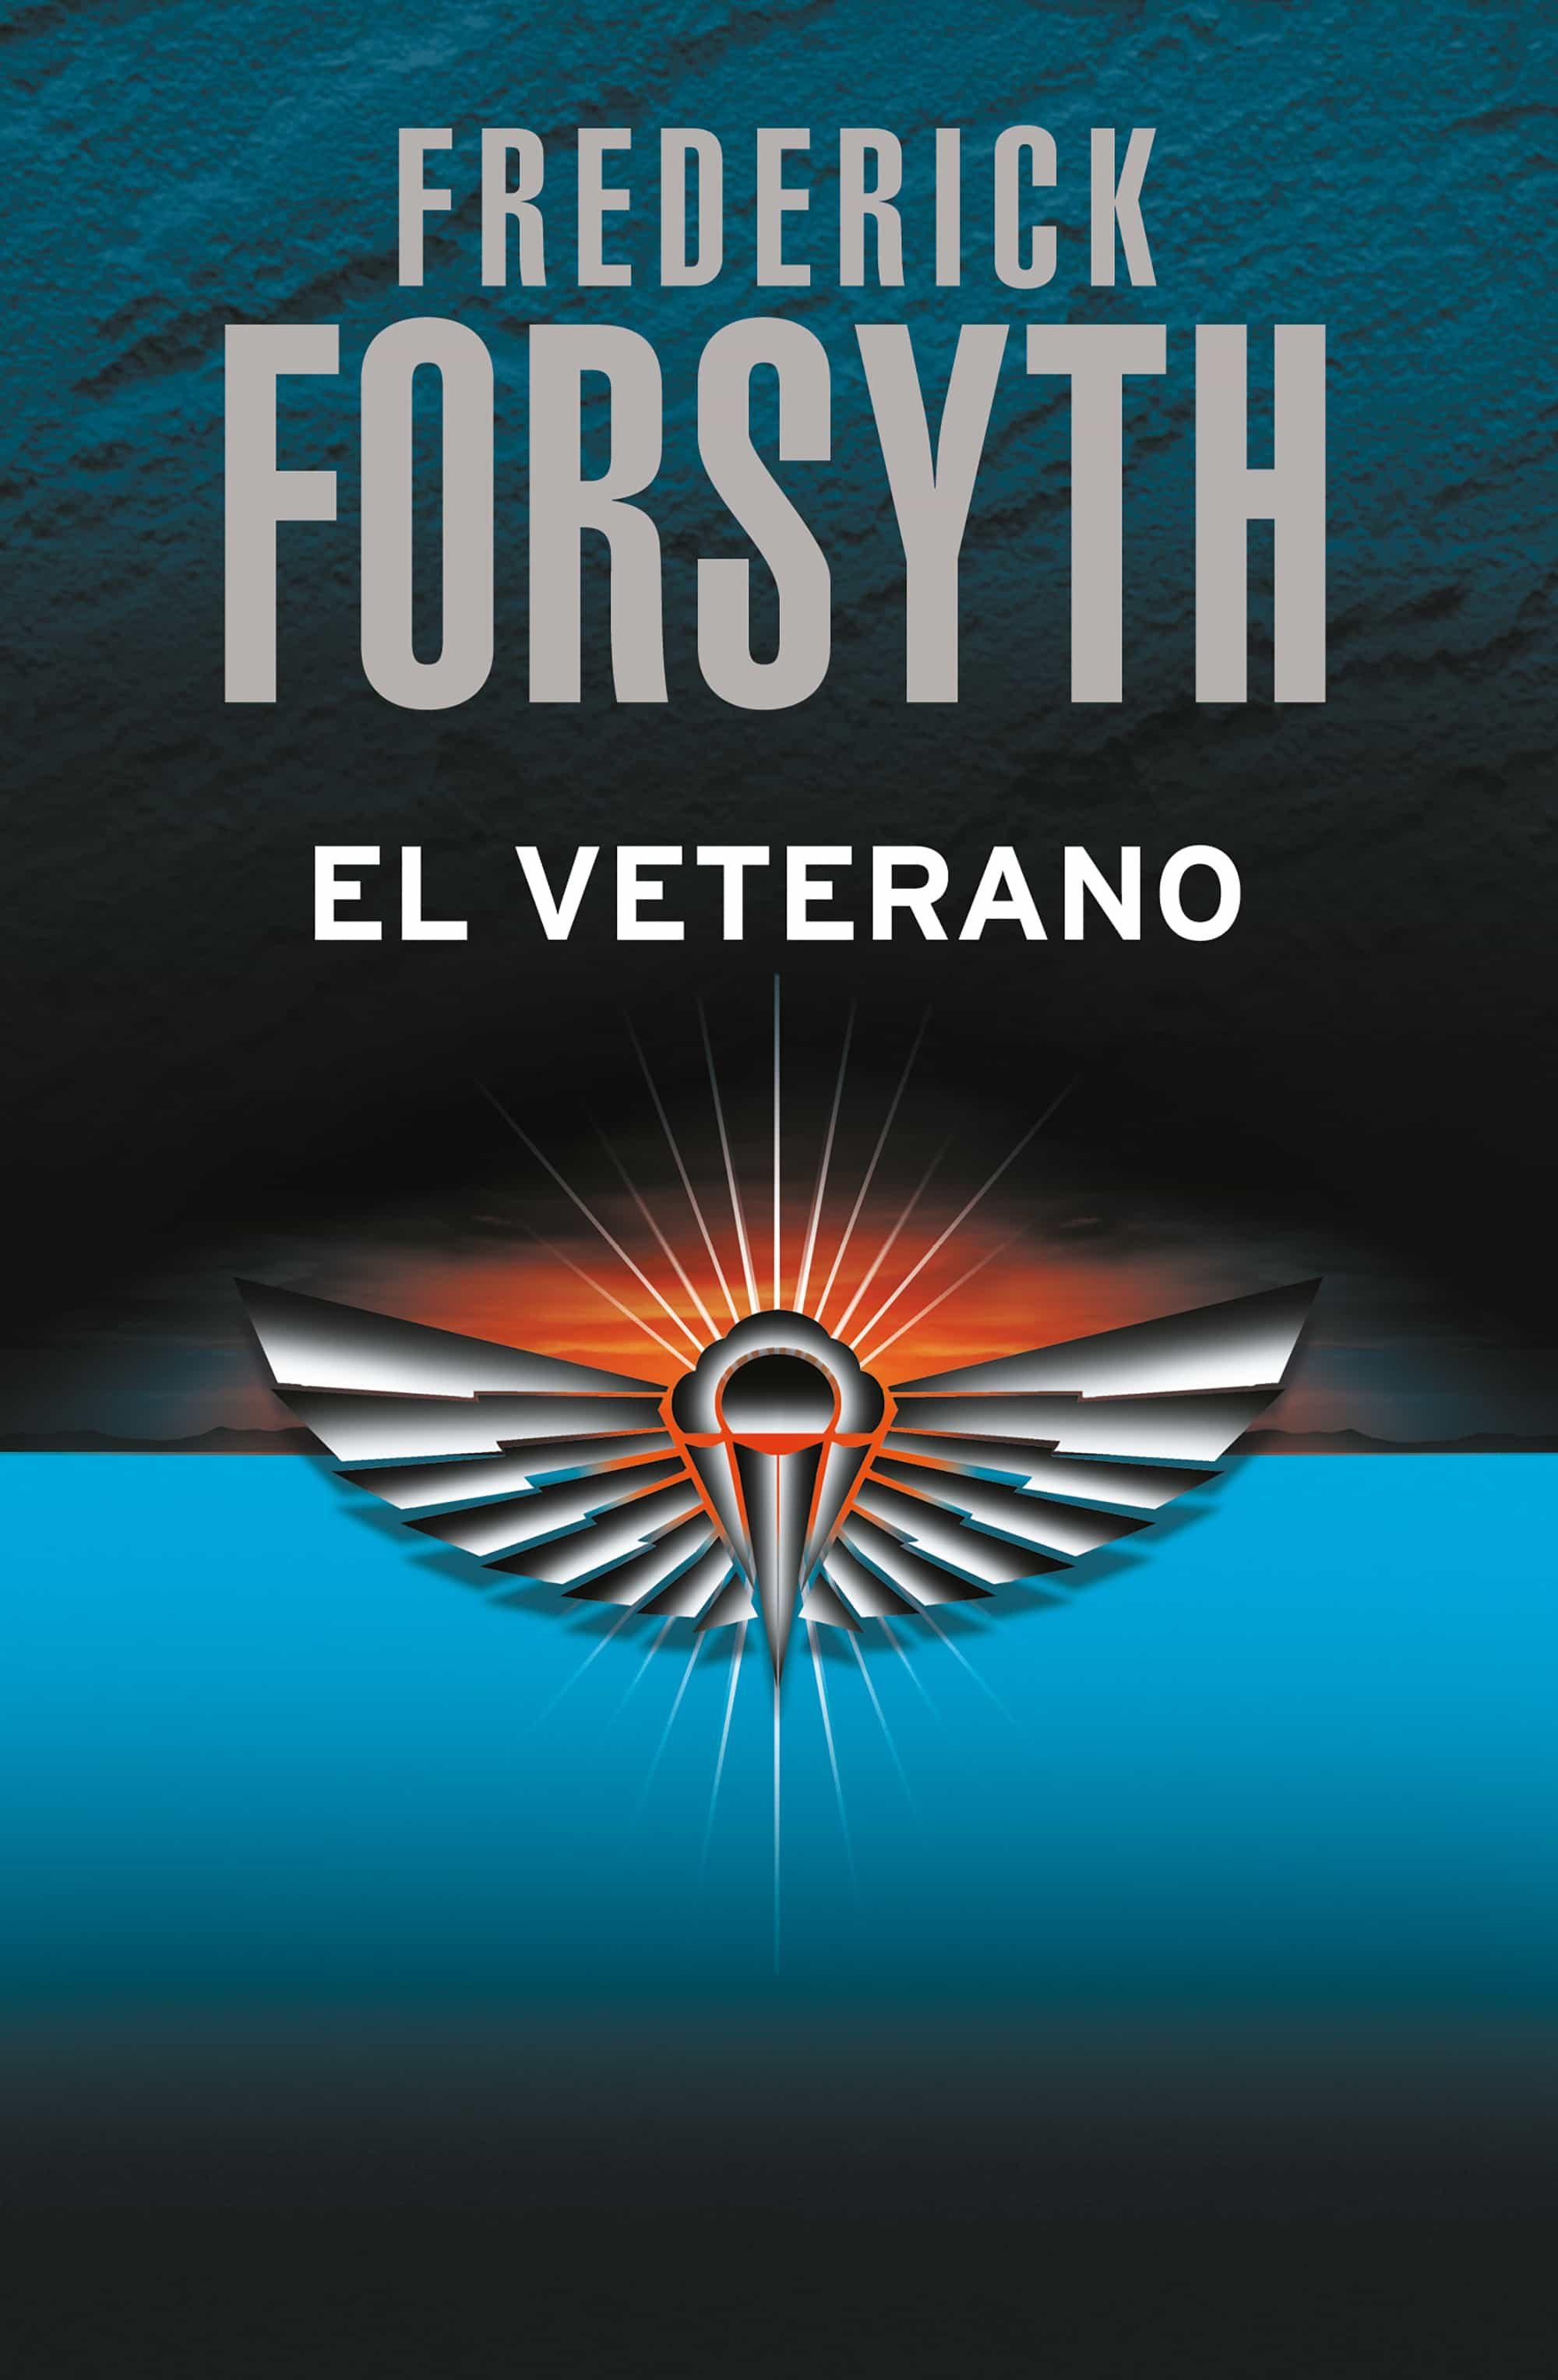 El Veterano   por Frederick Forsyth